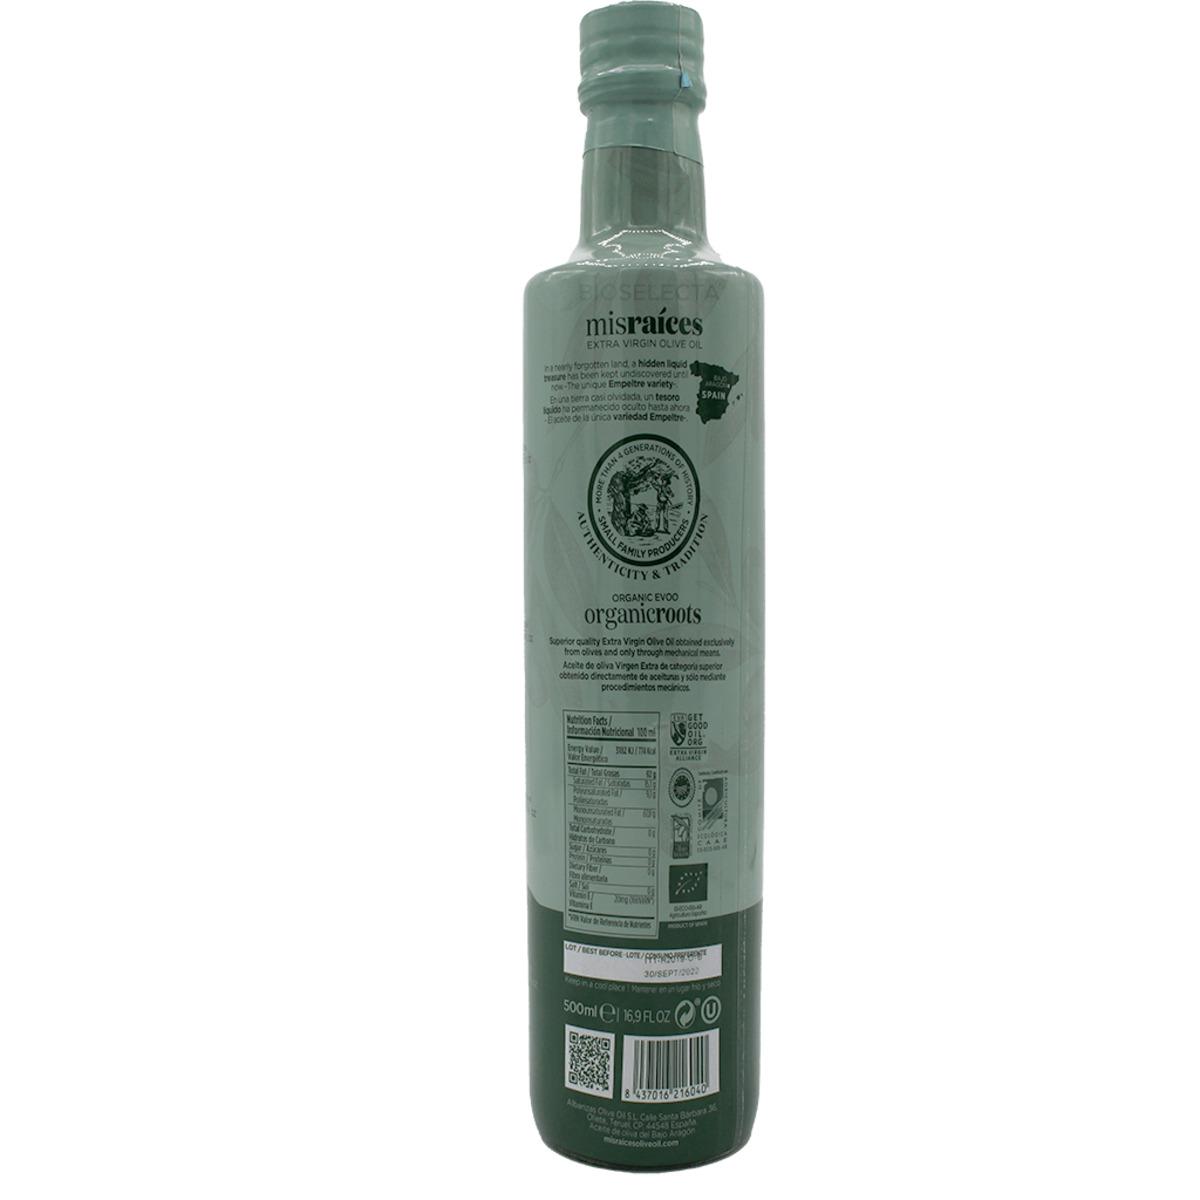 Aceite de oliva virgen extra. Mis raíces organic. ½ L. Bio (Oliete. Teruel)